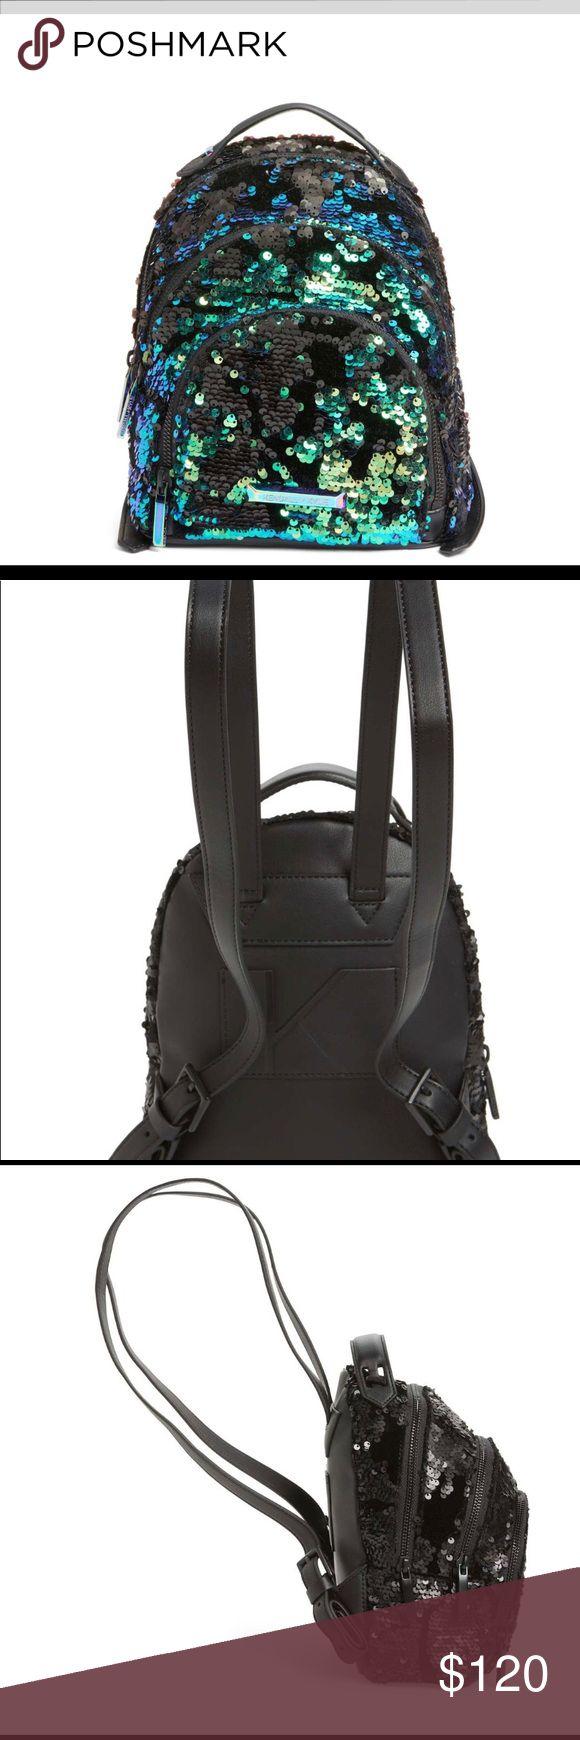 Kendall & Kylie Mini Sloane Velvet/Sequin Backpack Kendall & Kylie – Mini Sloane Velvet & Sequin Backpack Color: Metallic (first photo) Kendall & Kylie Bags Backpacks